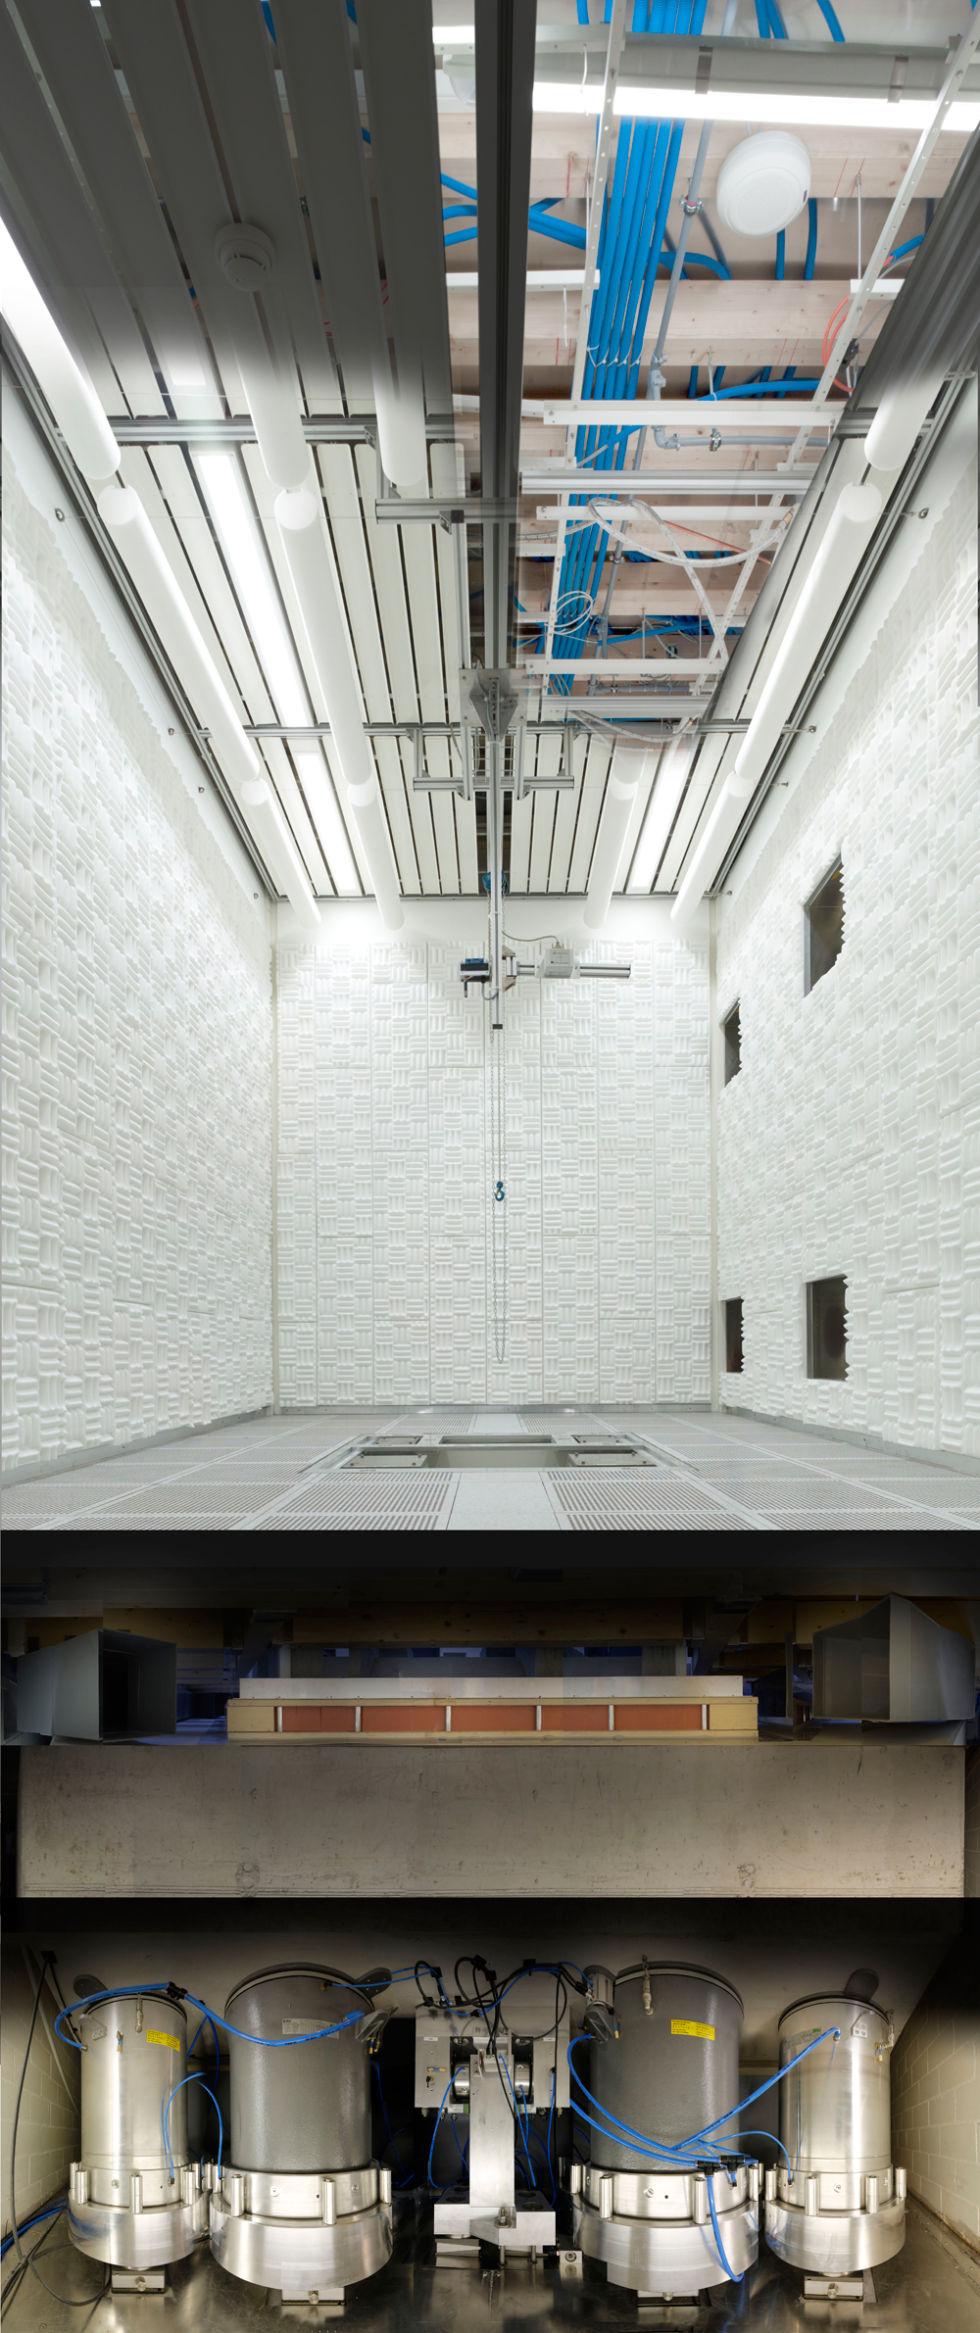 Inside the world's quietest room | Ars Technica